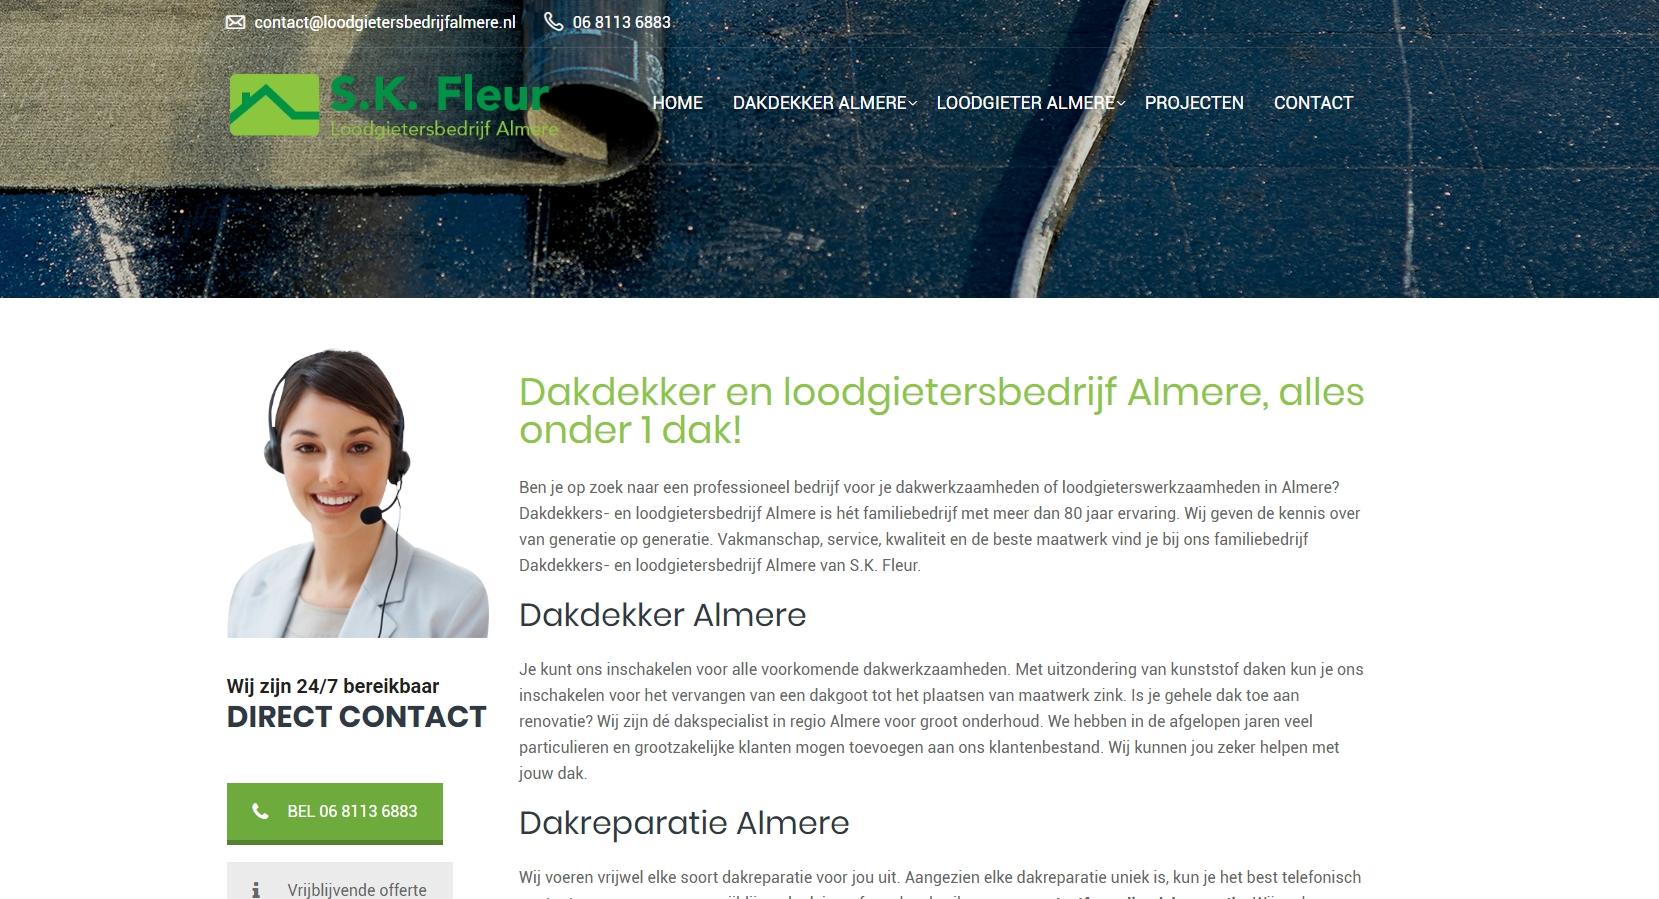 Loodgieter- & Dakdekkersbedrijf Almere